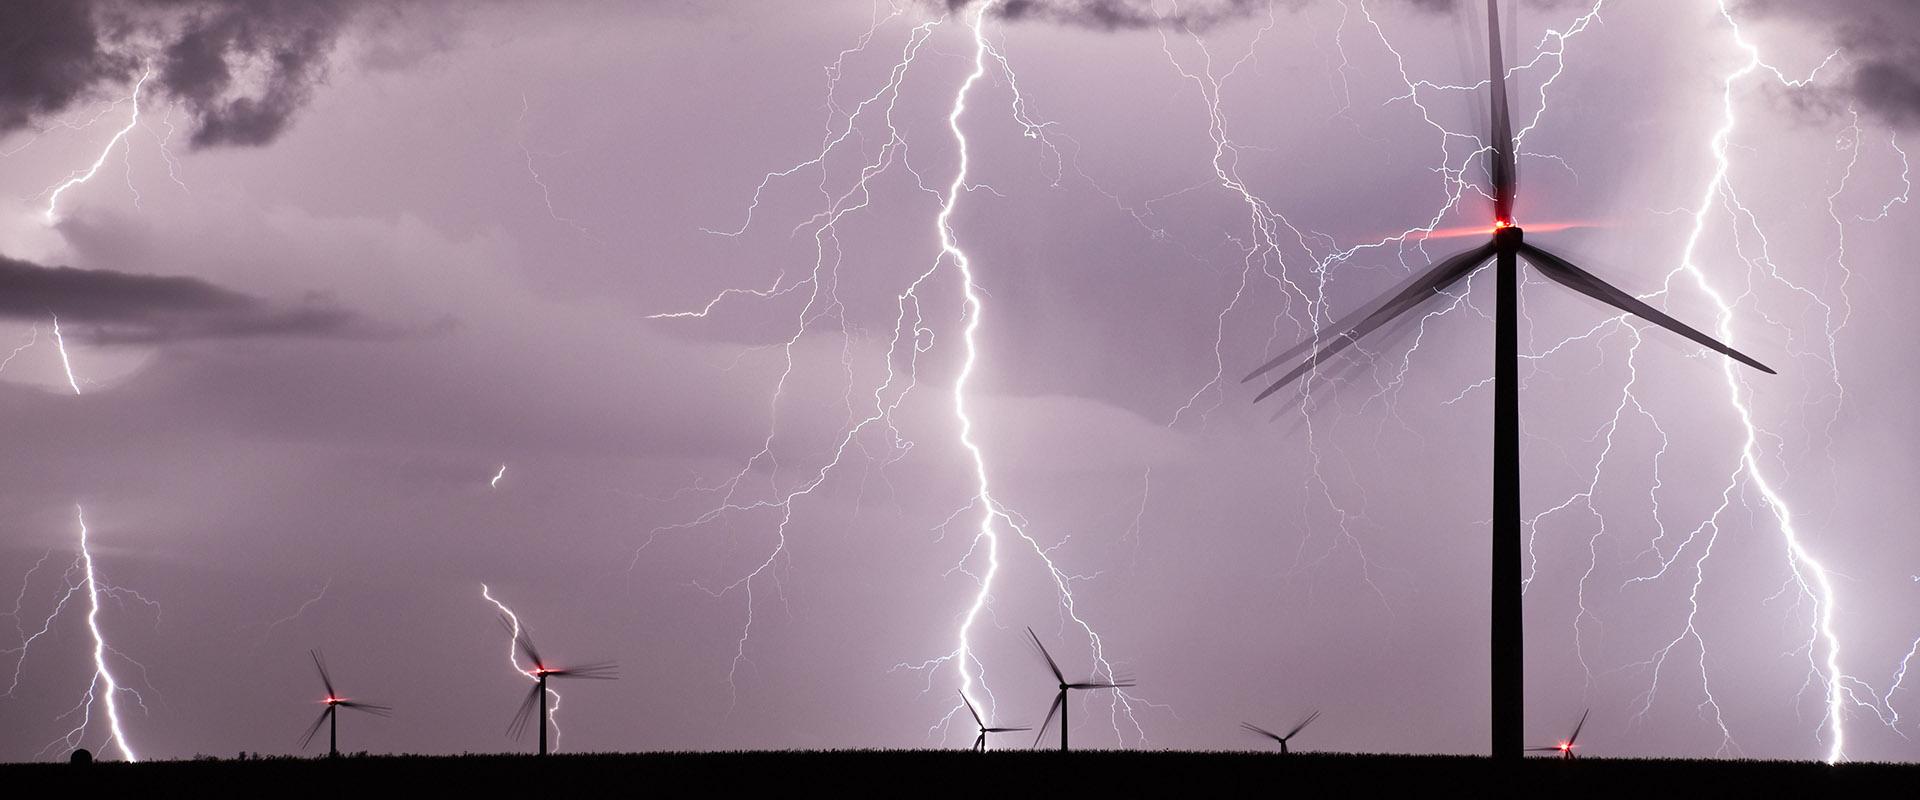 windturbines lightning